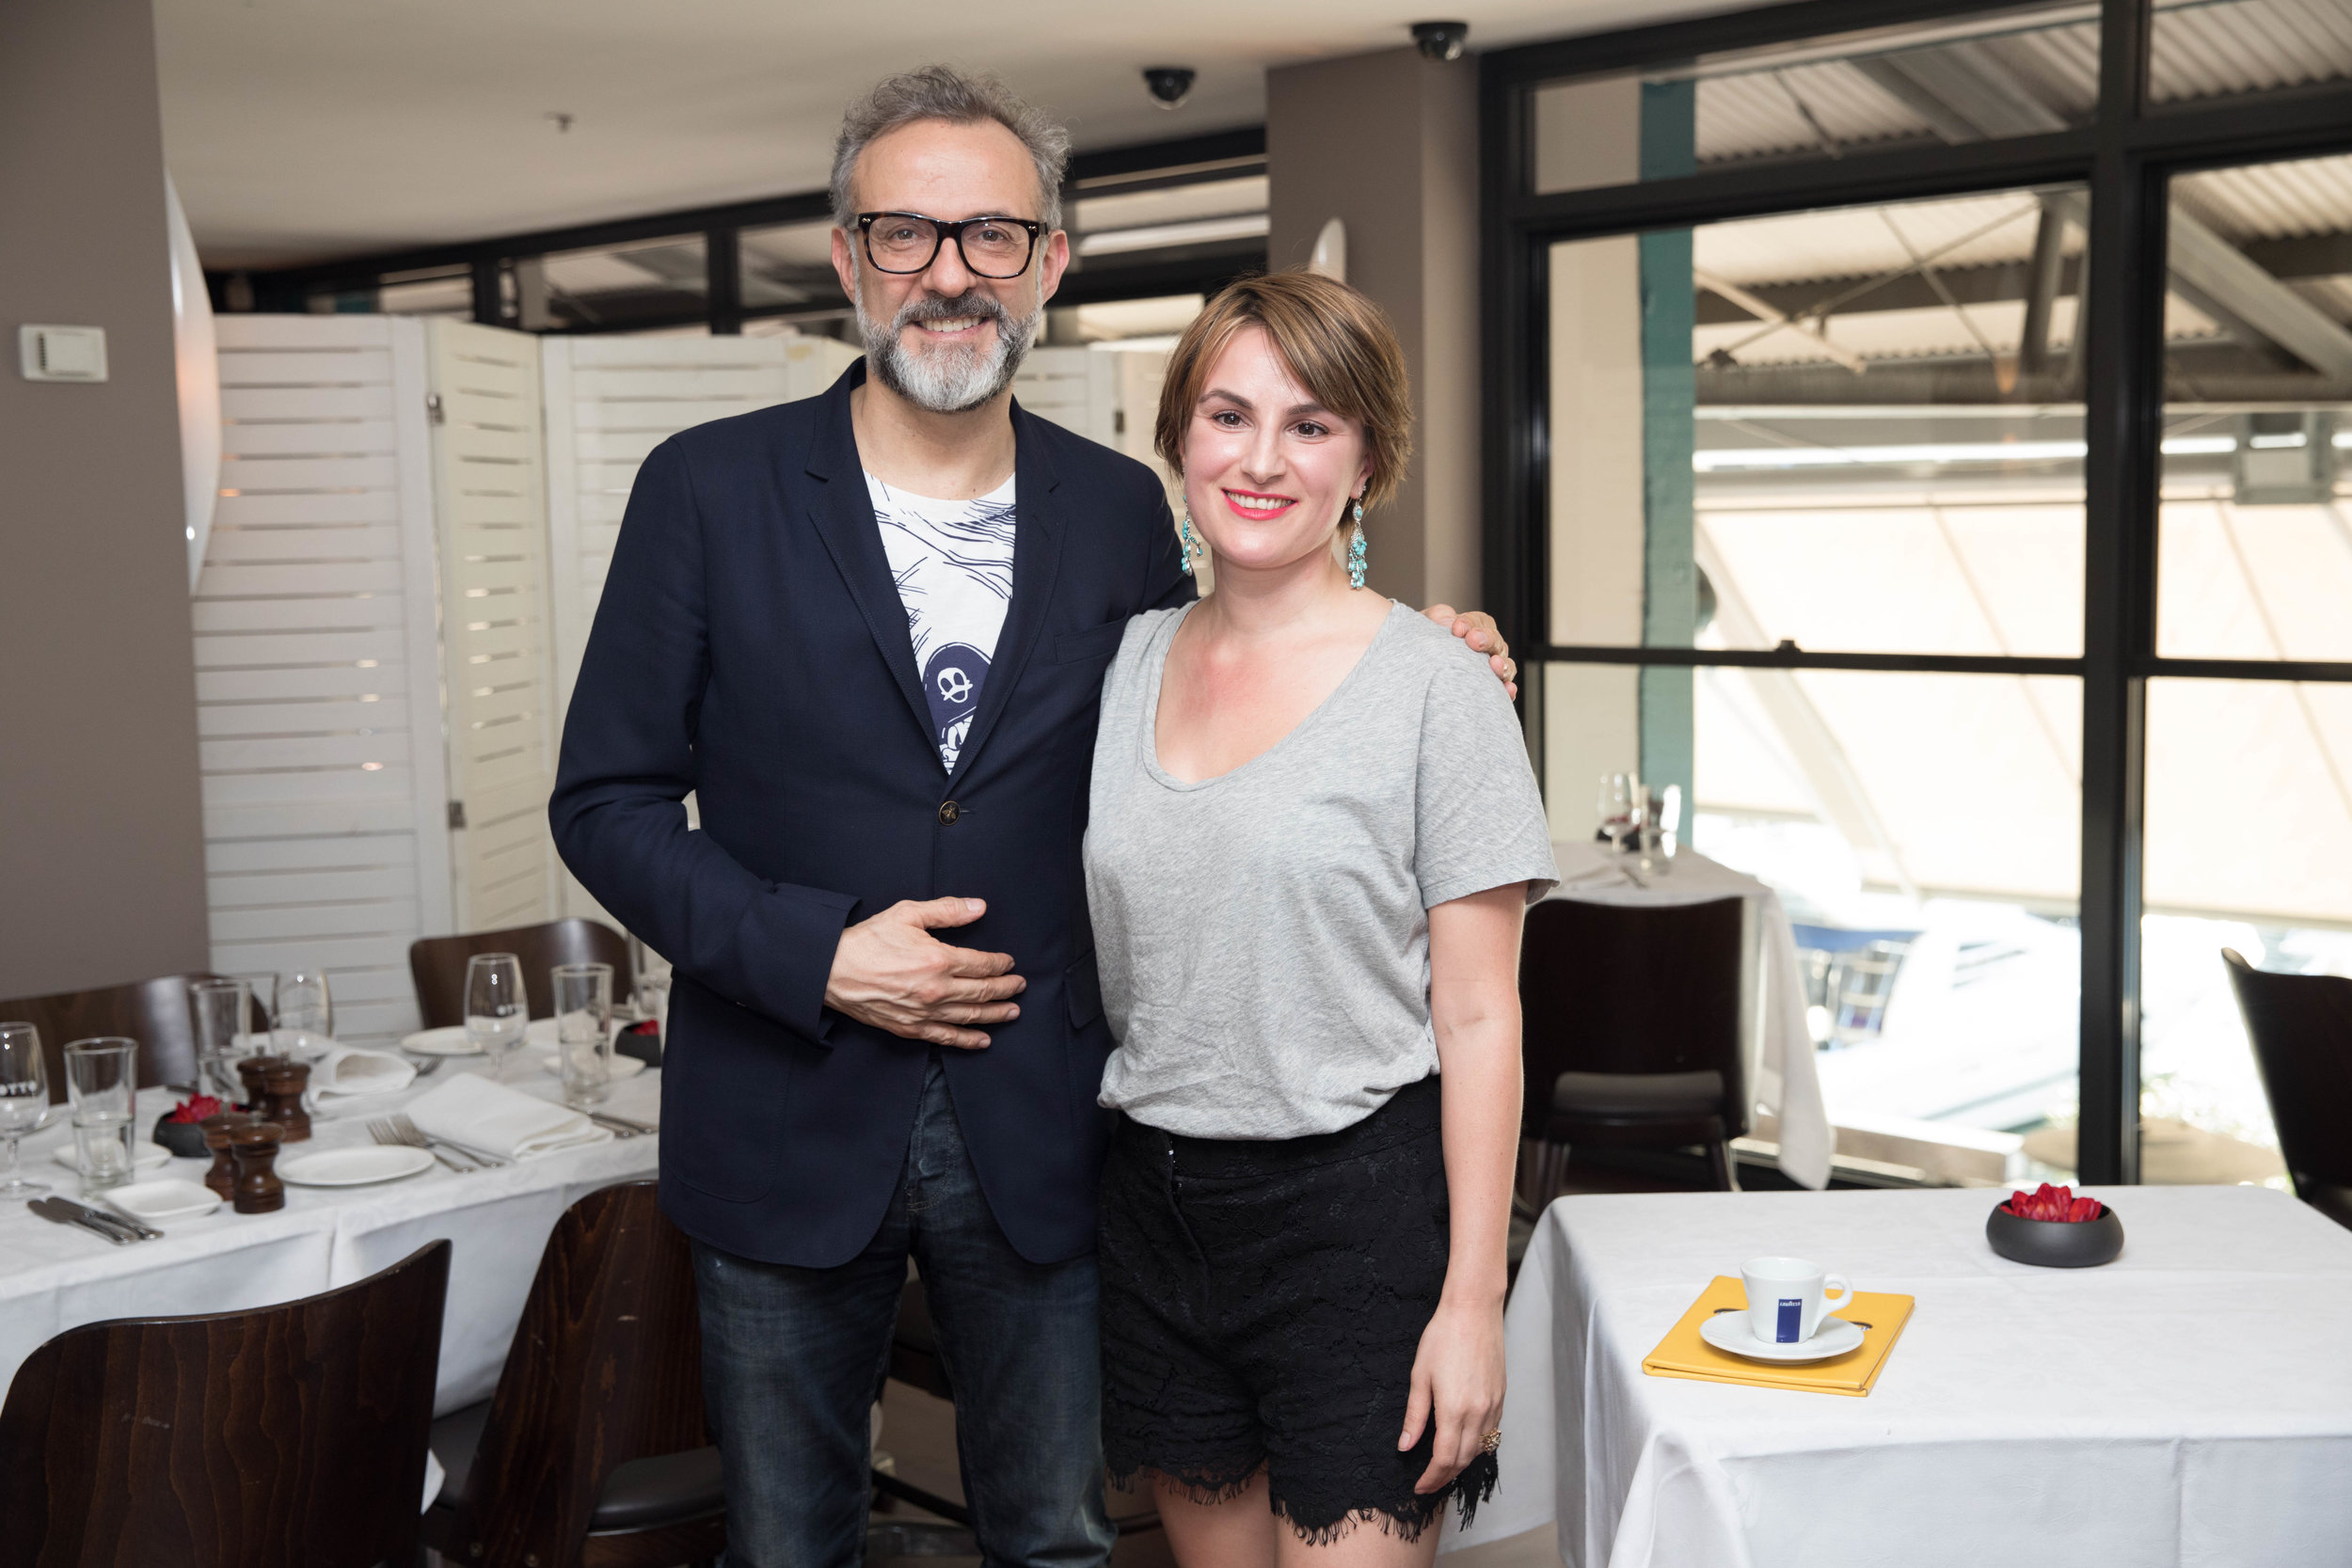 lavazza-massimo-bottura-worlds-50-best-restaurants-awards-2017-renata-gortan.jpg